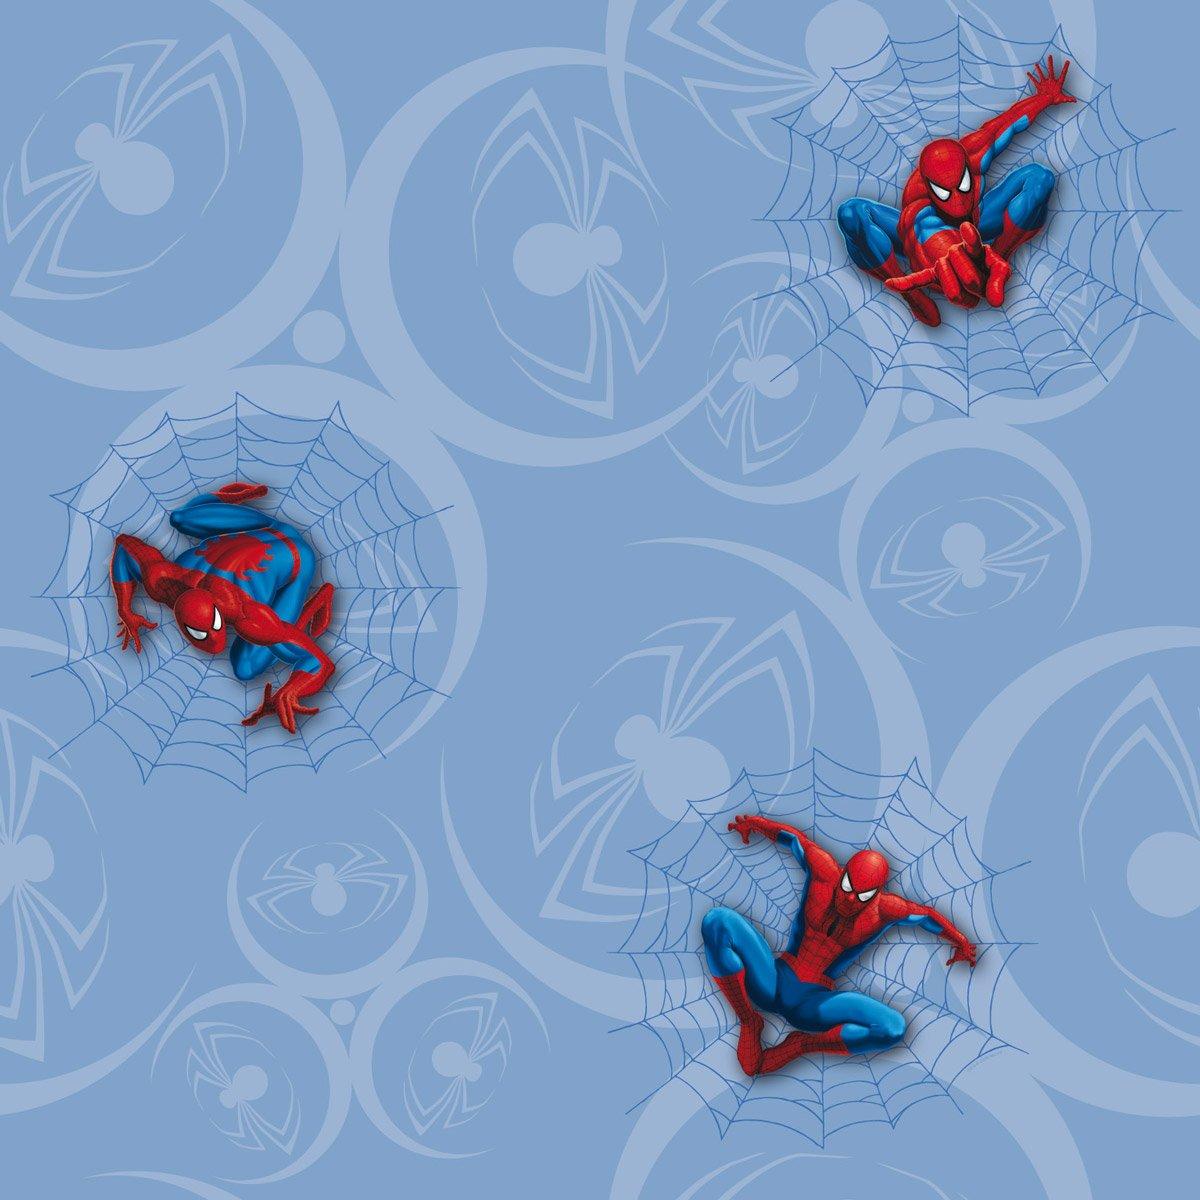 colecci/ón MainRange dise/ño de Spiderman Graham /& Brown Spiderman Papel pintado para habitaci/ón infantil